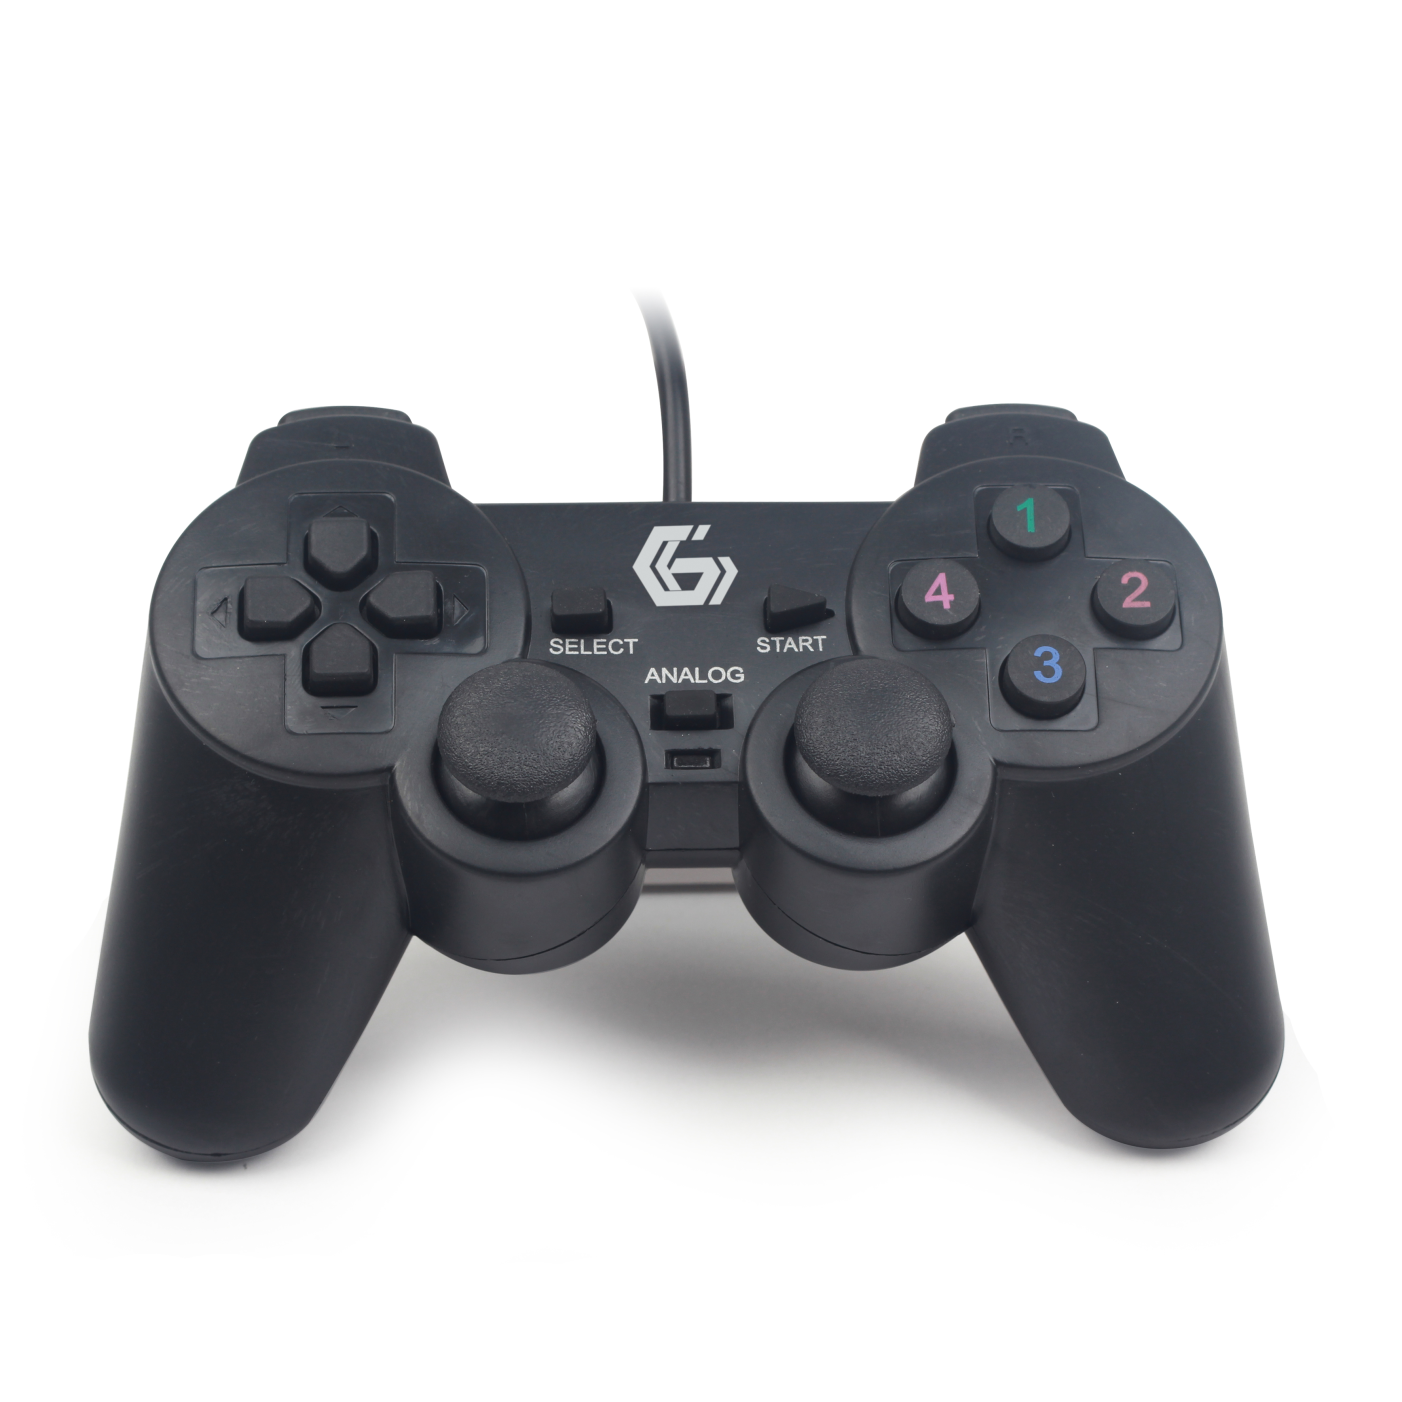 Select Gembird Gamepad / Joystick JPD-FFB-A driver for download